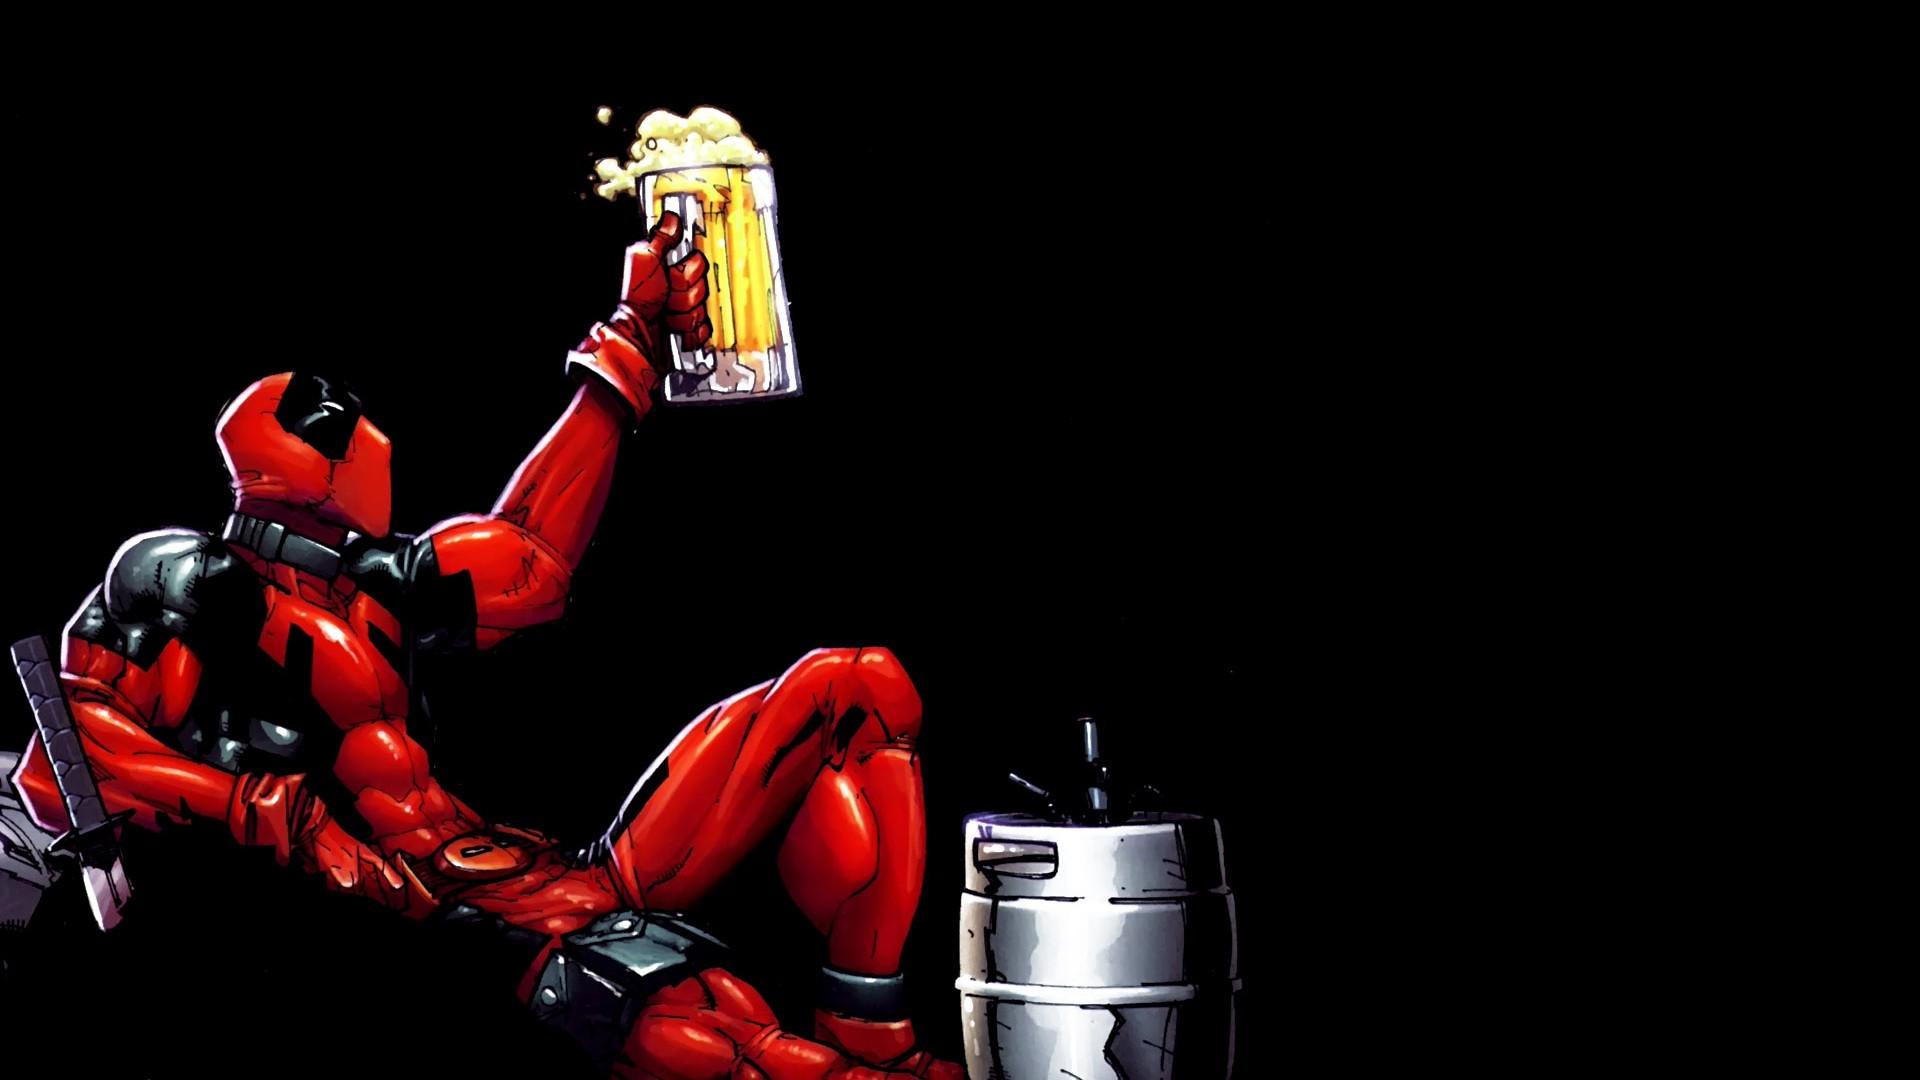 Superhero Deadpool Comic Art 1920x1080 Px Computer Wallpaper Fictional Character Action Figure